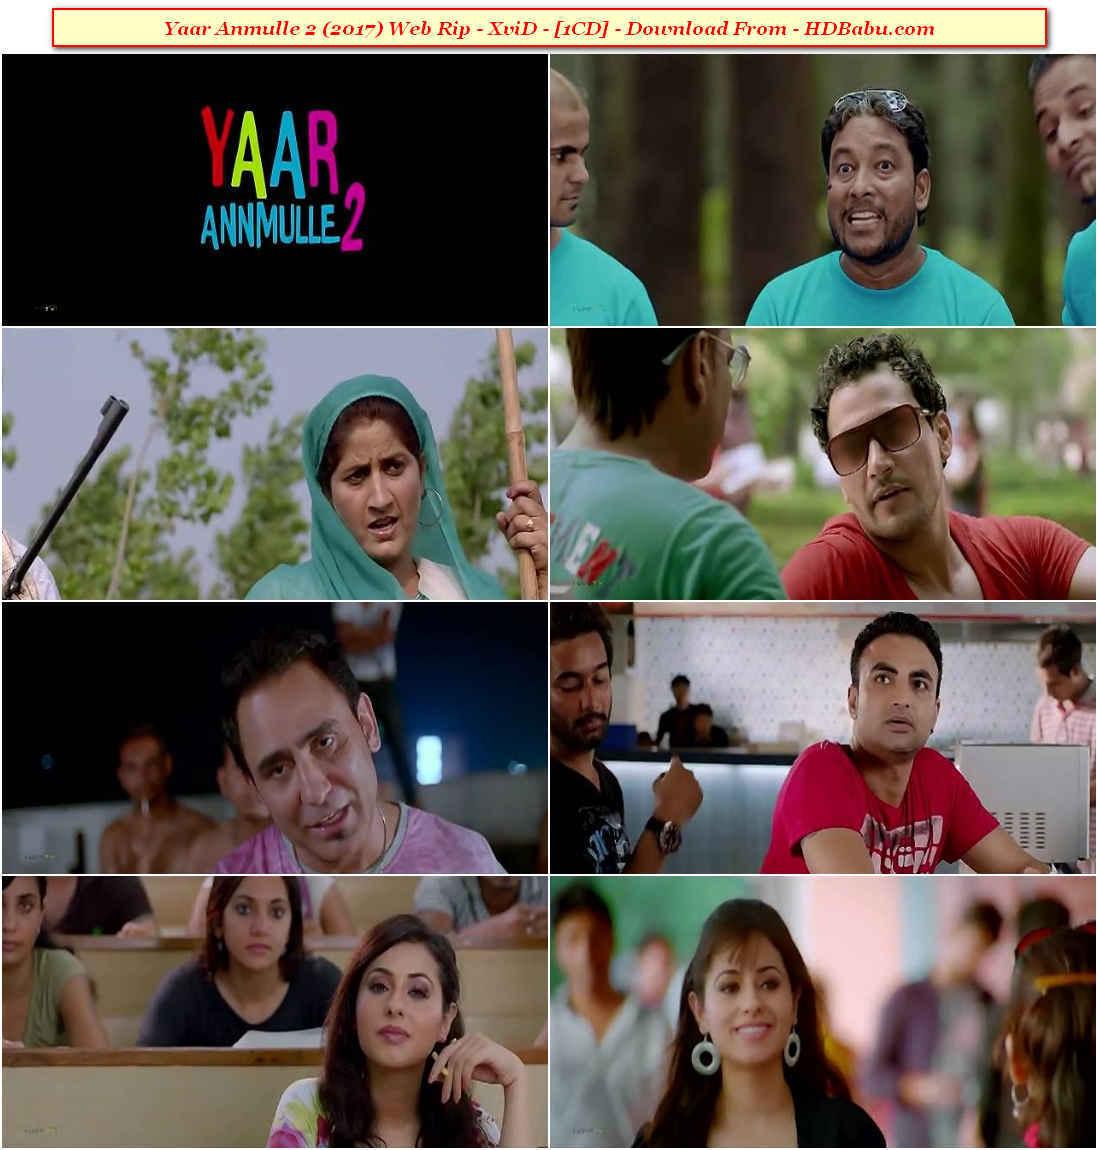 Yaar Annmulle 2 Full Movie Download